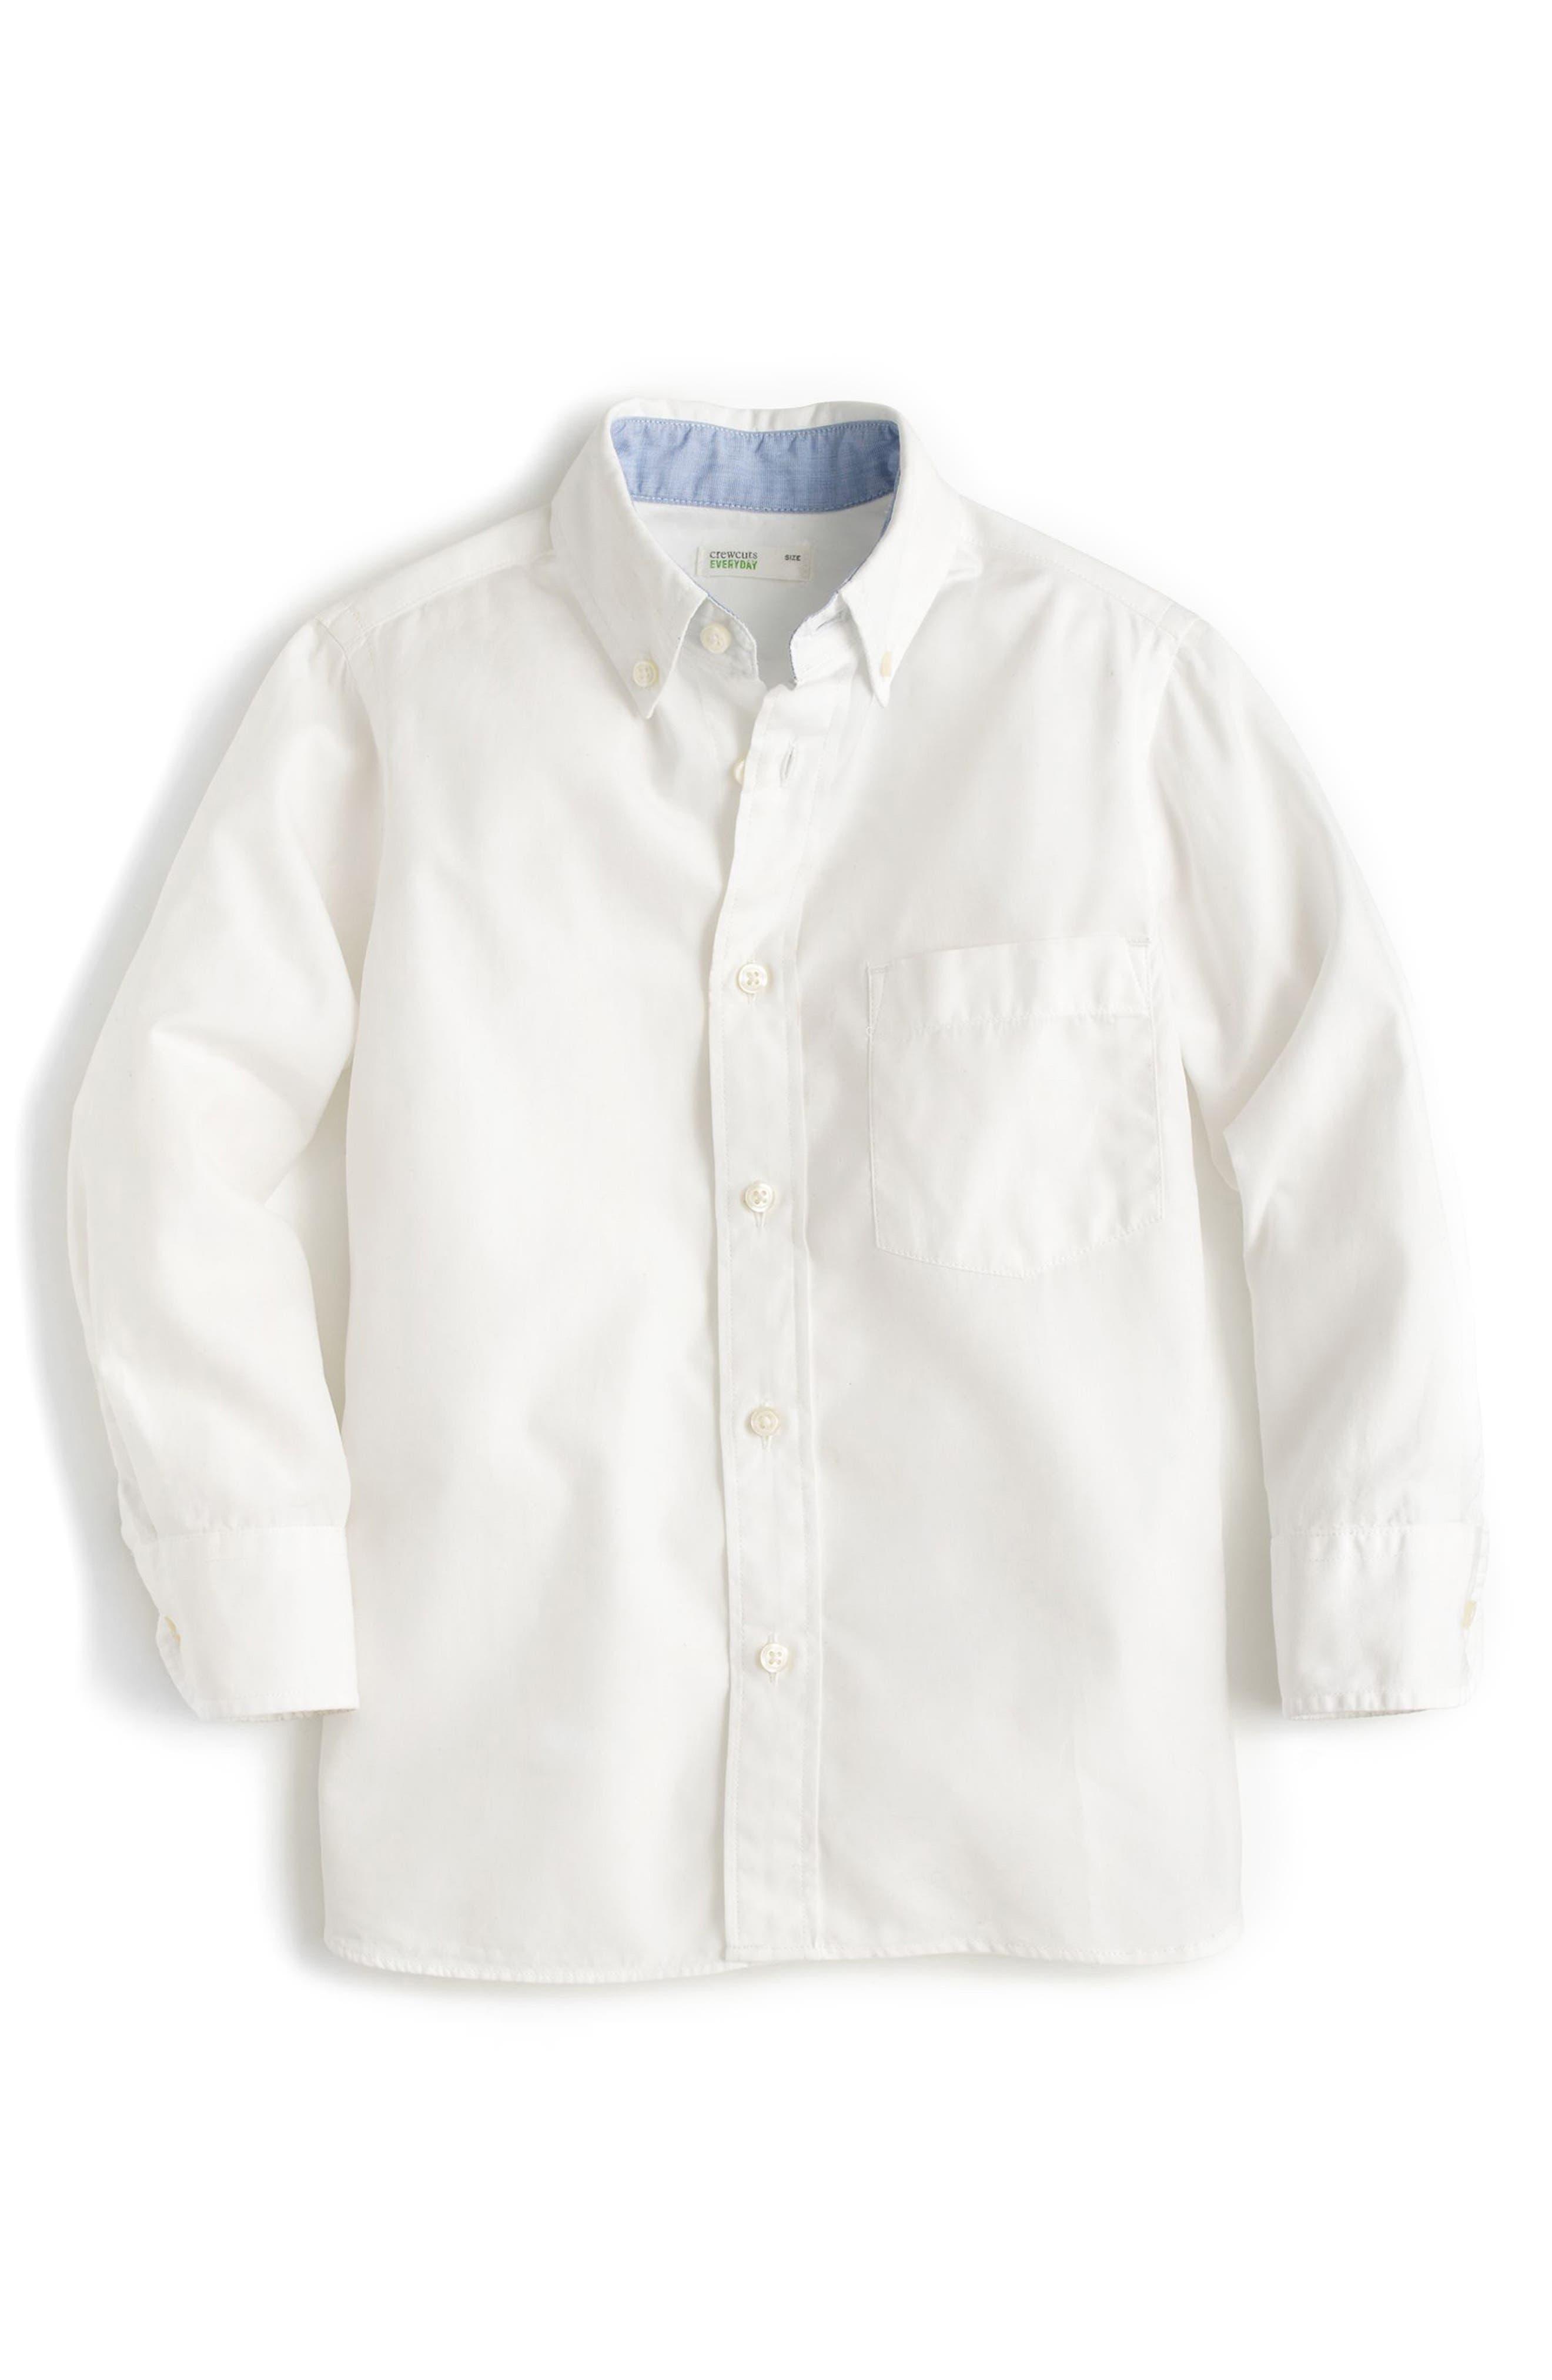 crewcuts by J.Crew Everyday Button Down Sport Shirt (Toddler Boys, Little Boys & Big Boys)